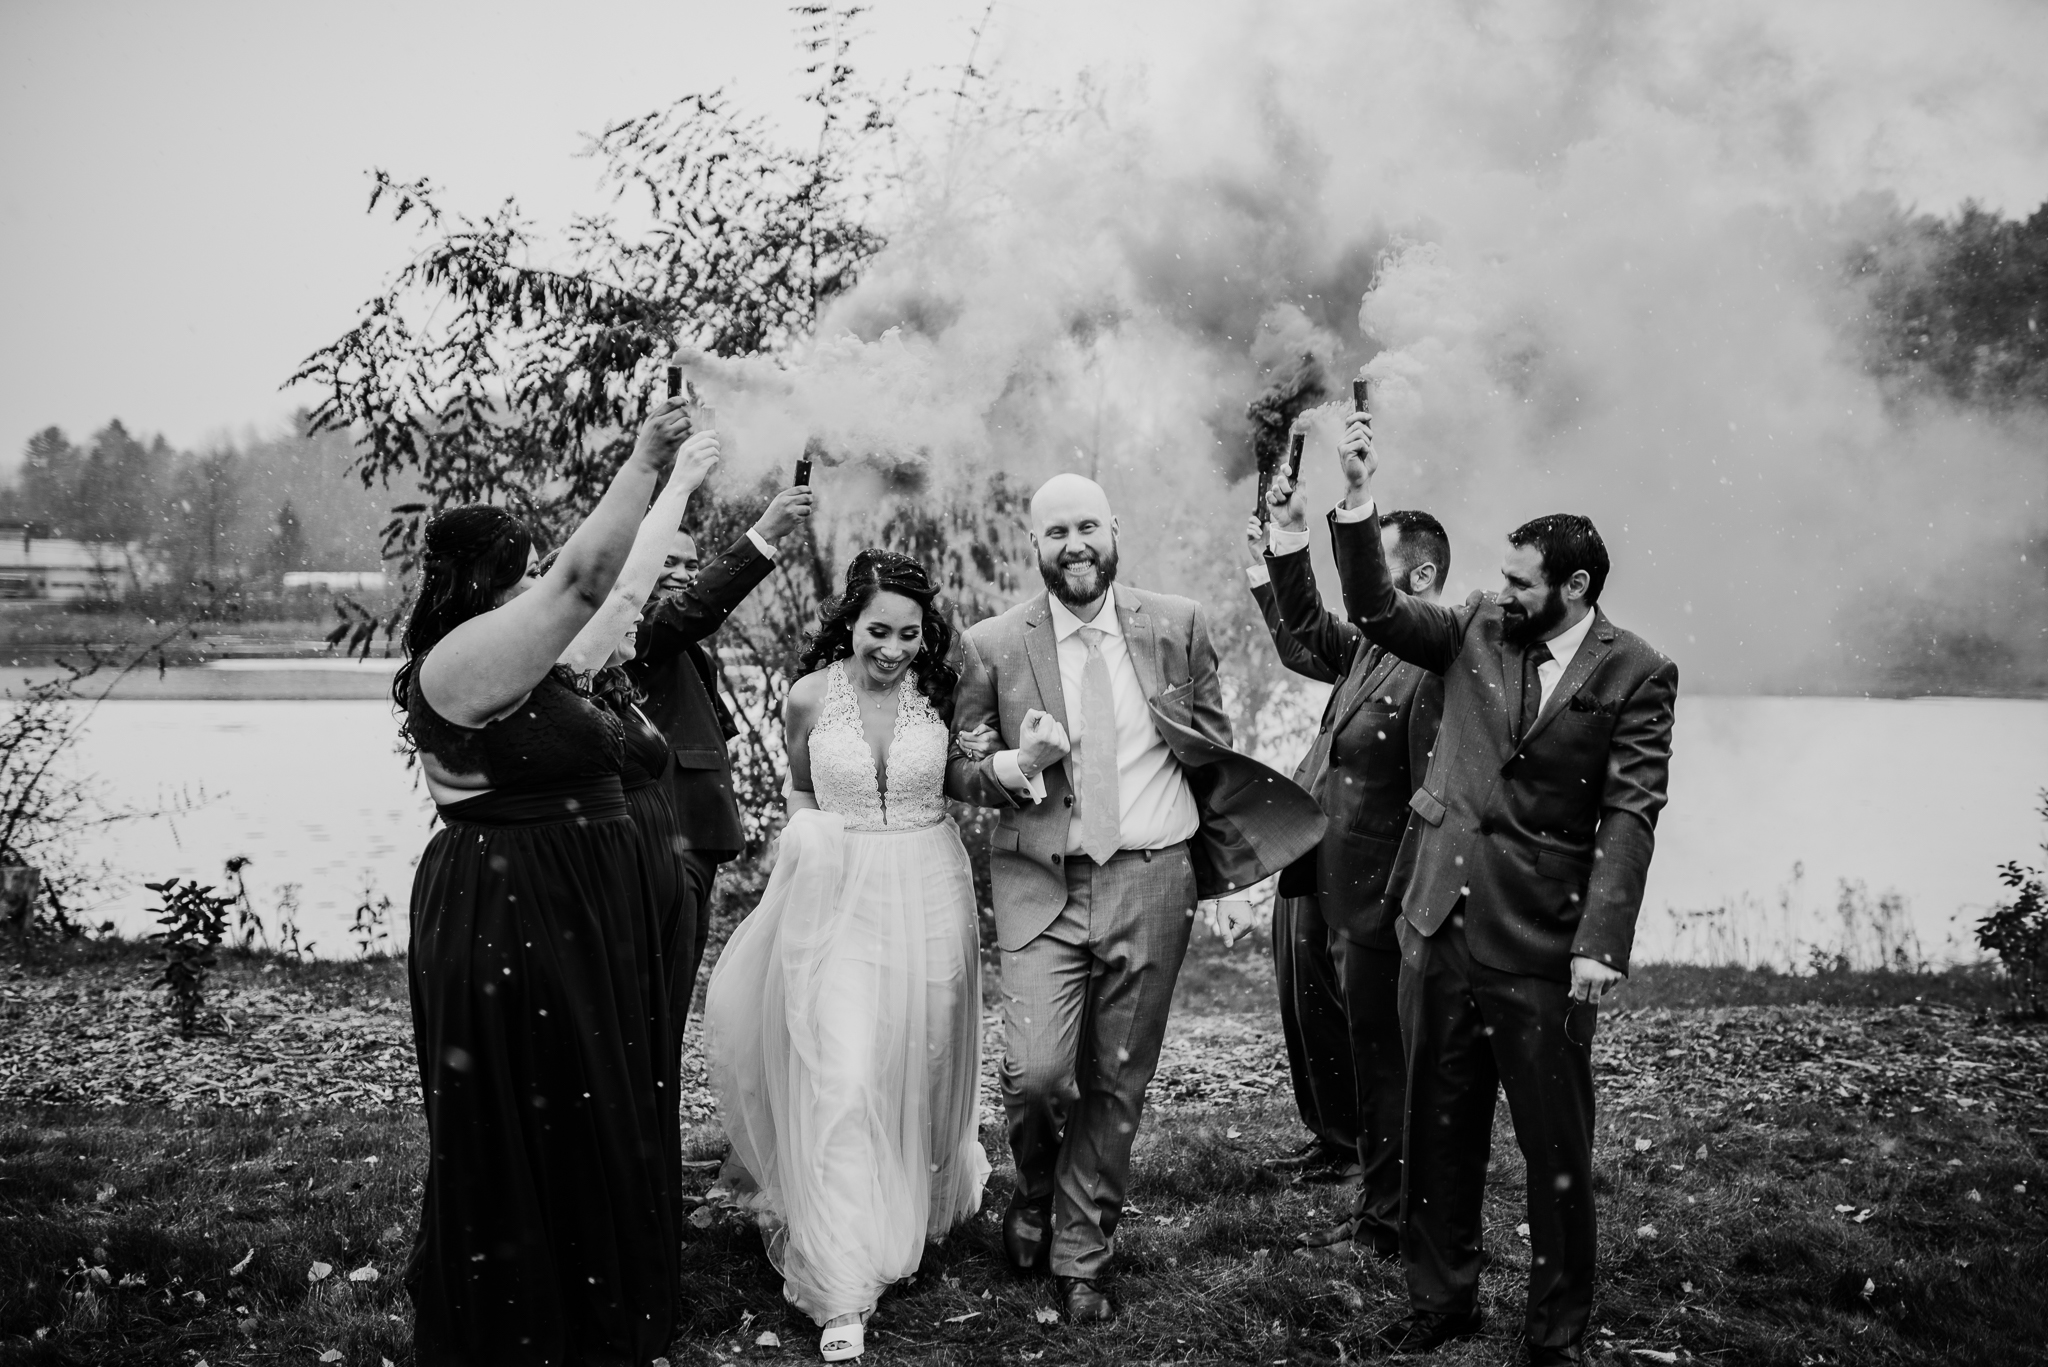 corinna Maine wedding Photography-14.jpg